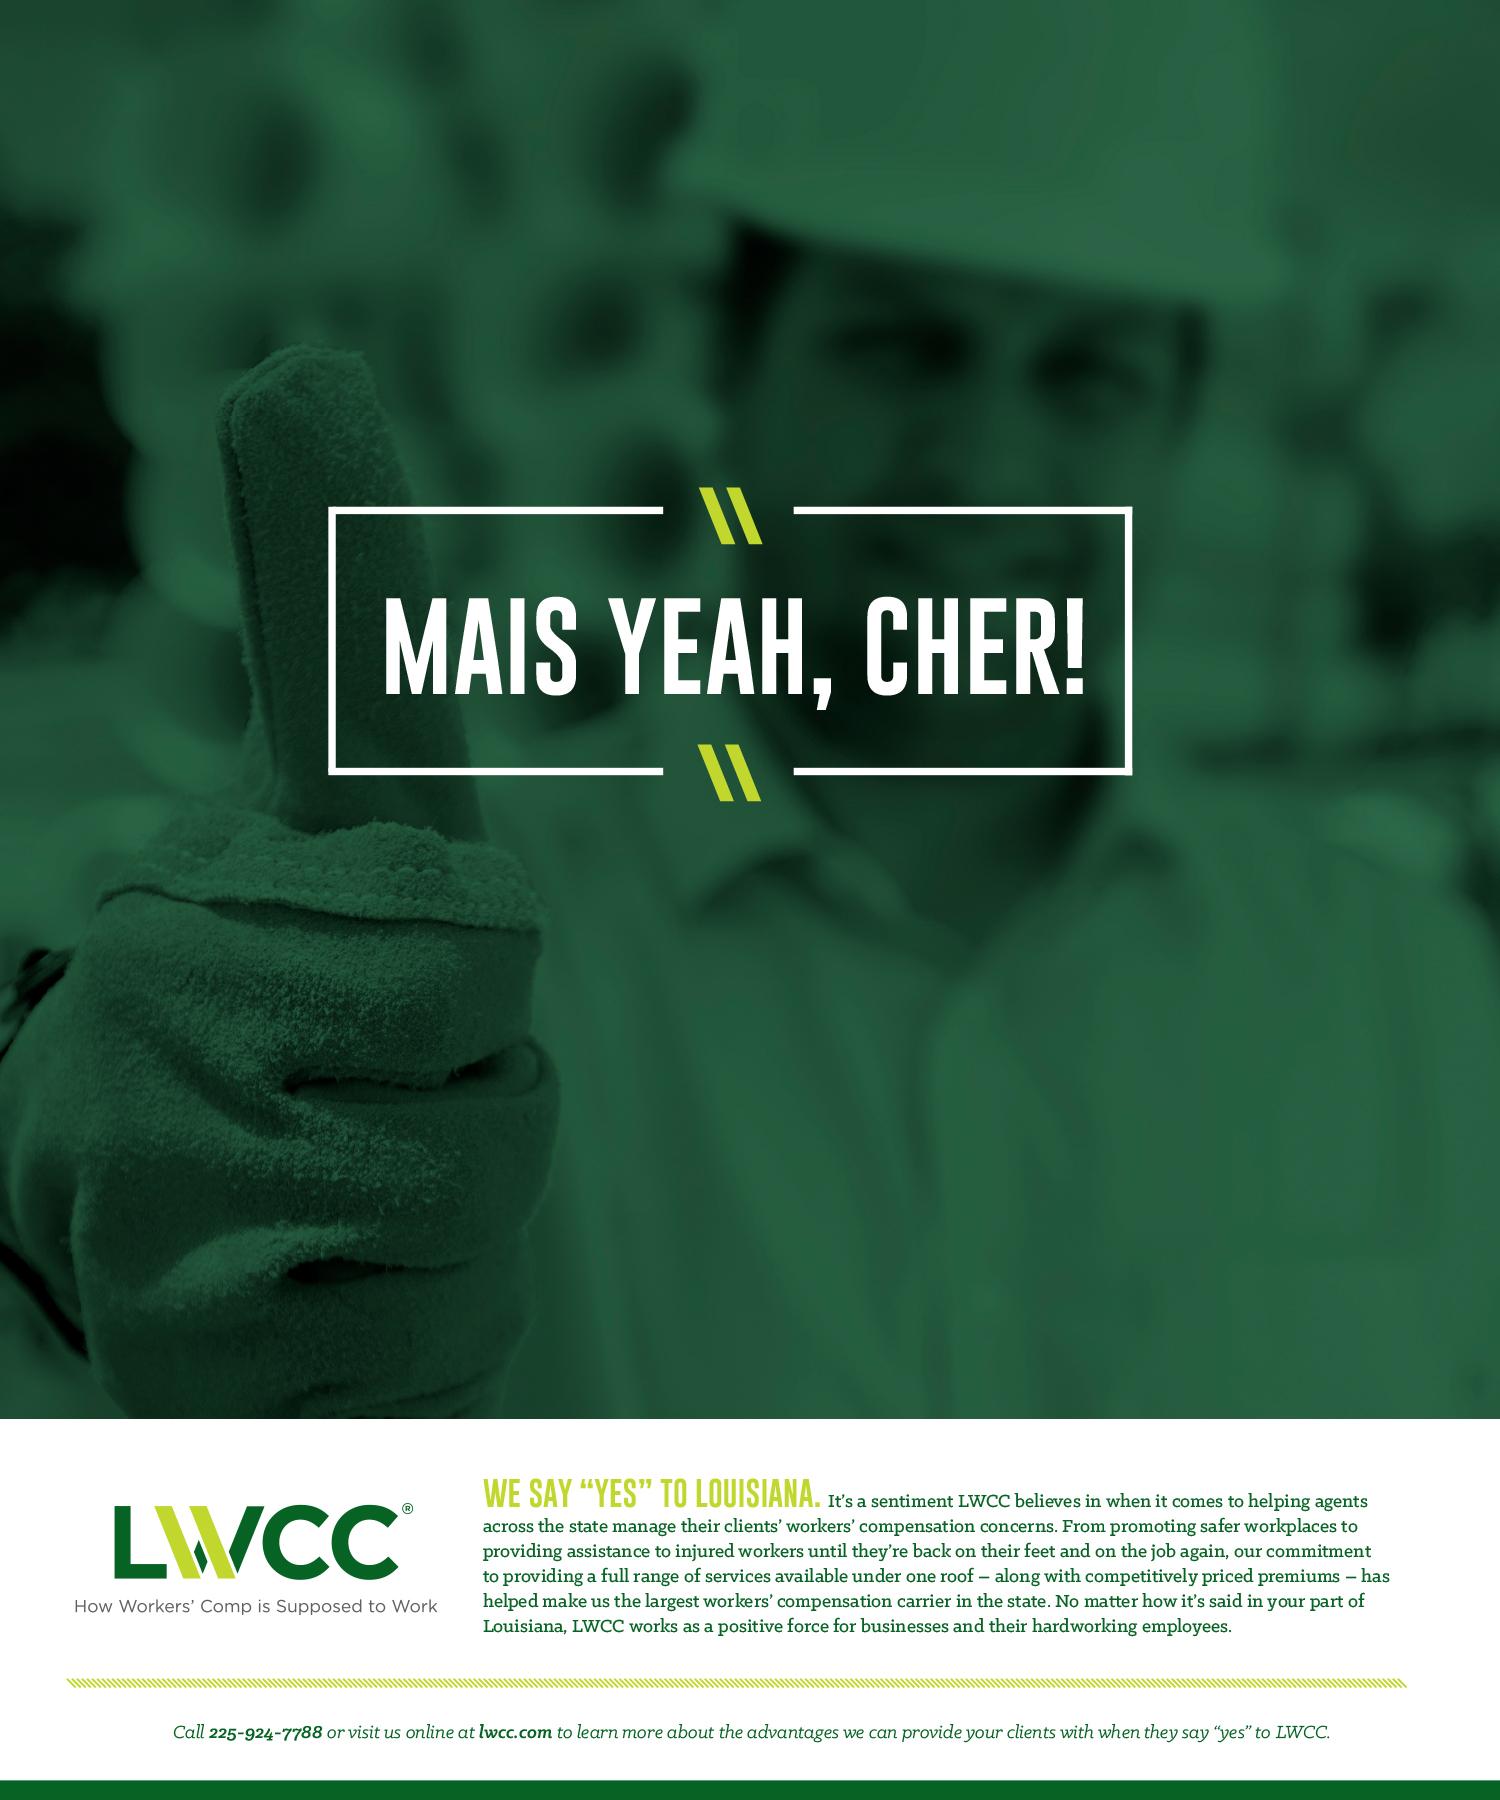 LWCC: 2015 Print Ad — Mais Yeah, Cher